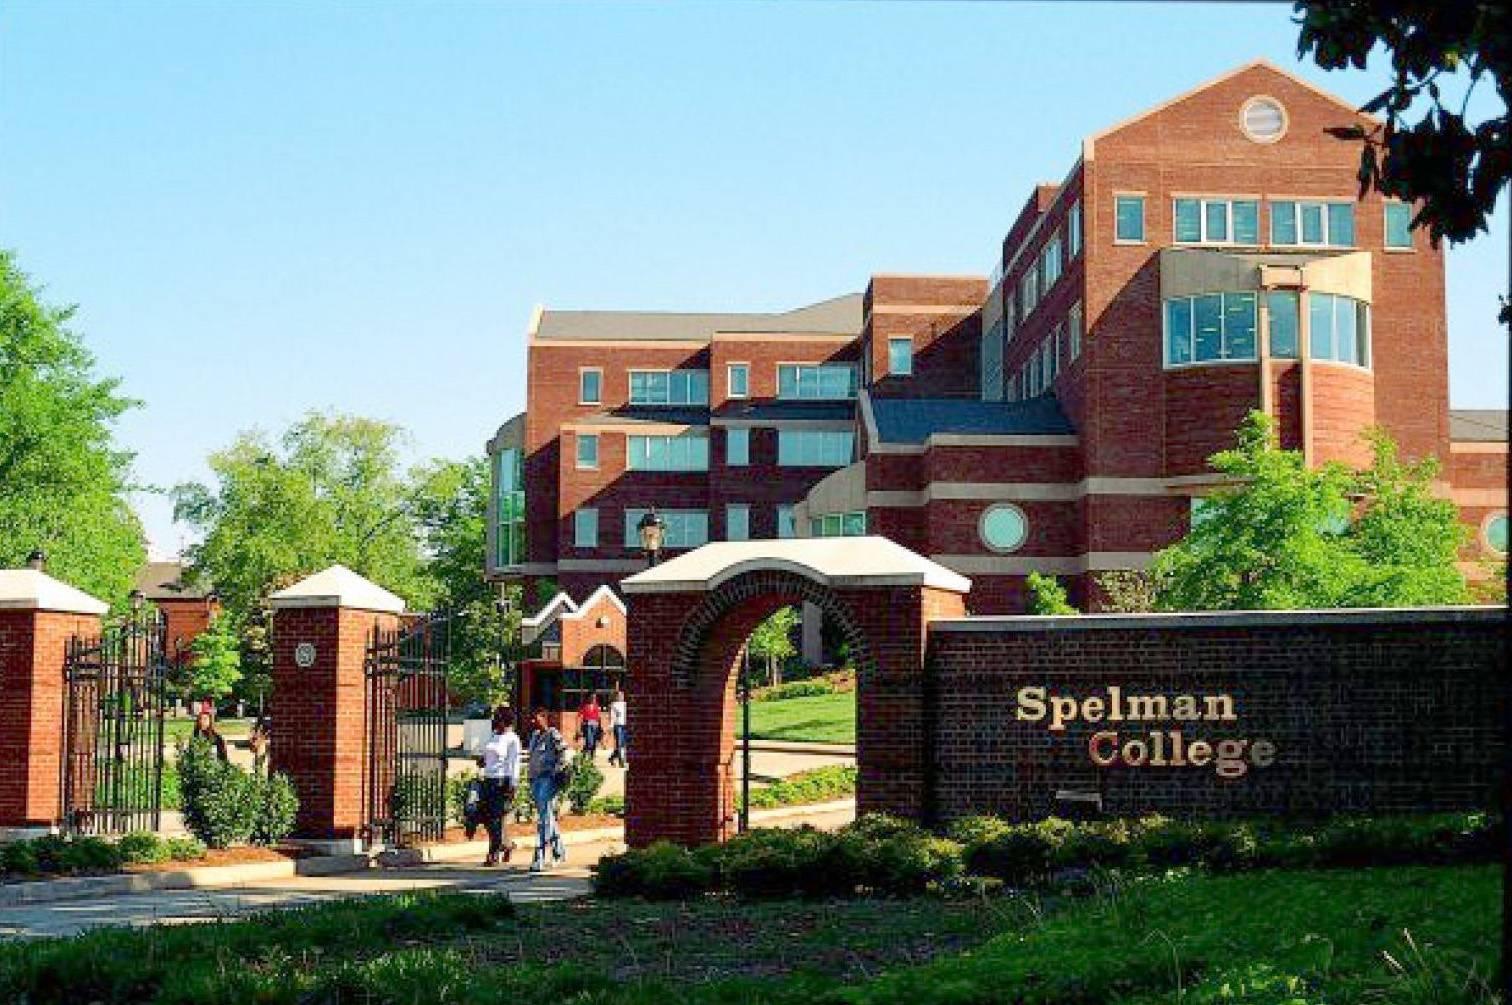 /content/dam/betcom/images/2013/10/National-10-15-10-31/102313-national-tuition-hbcu-spelman-college.jpg